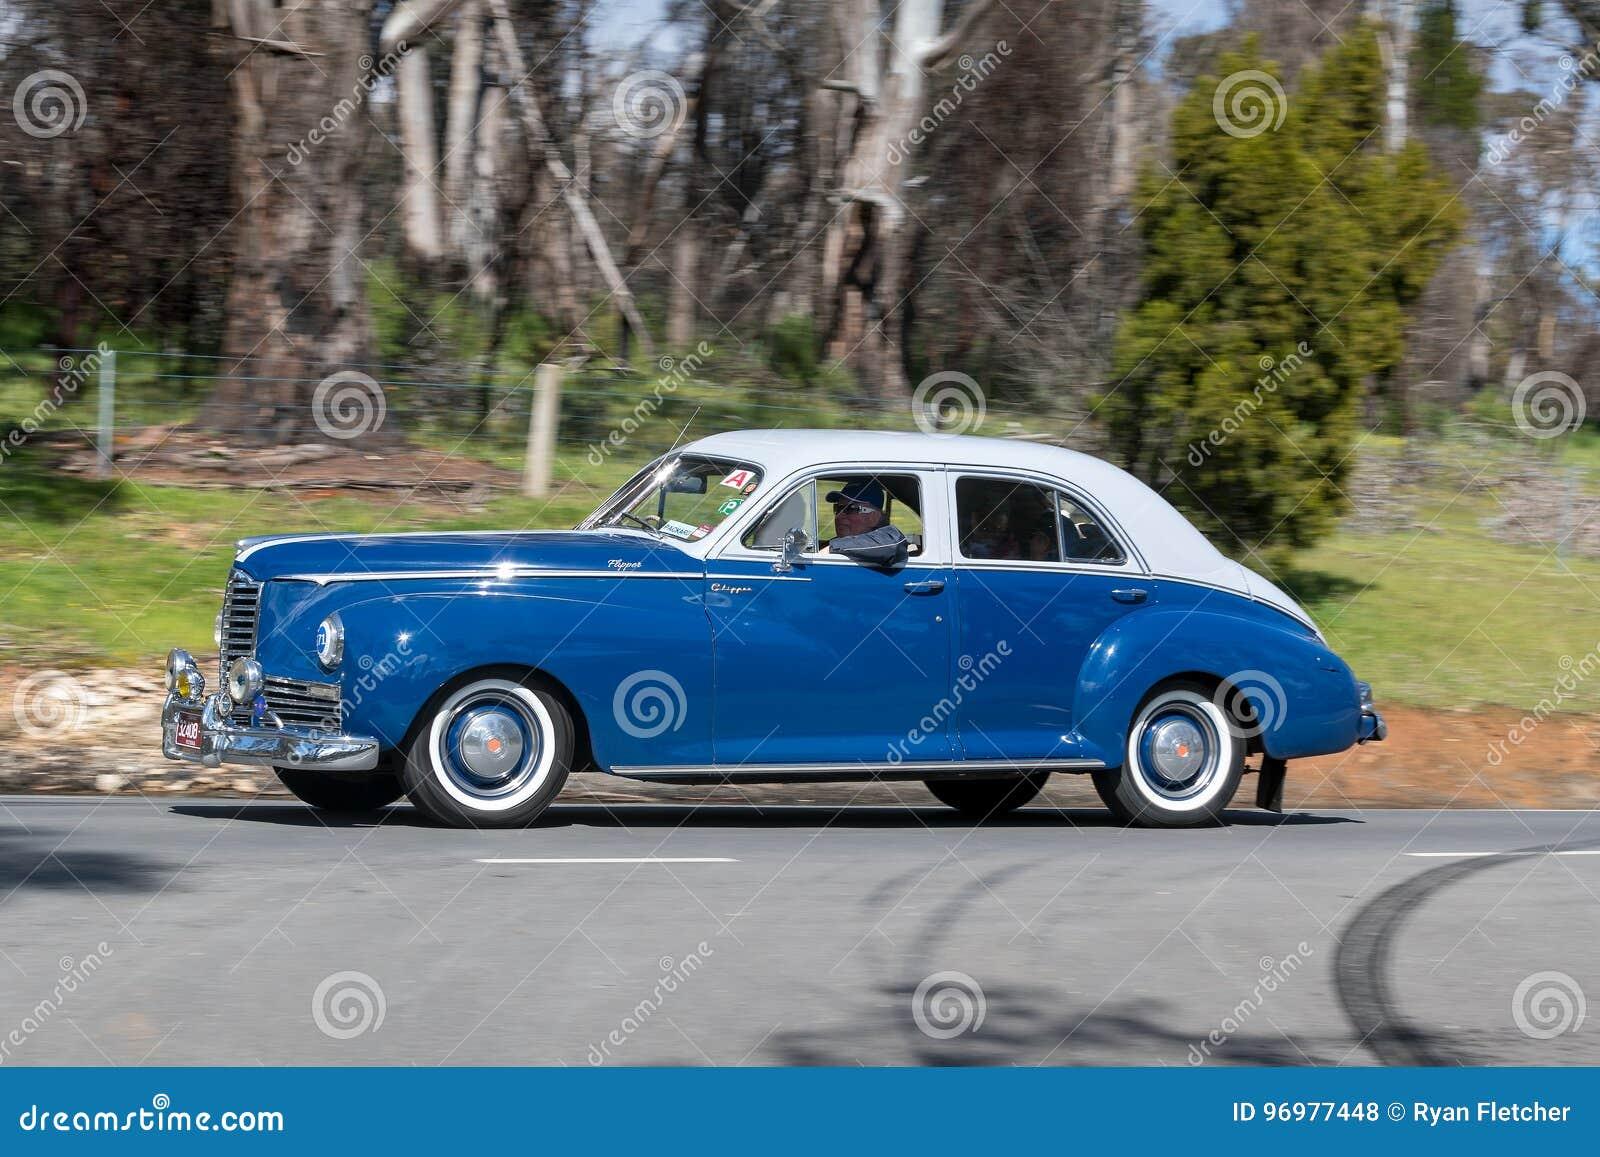 1946 Packard Clipper 6 Sedan Editorial Stock Photo - Image of autos